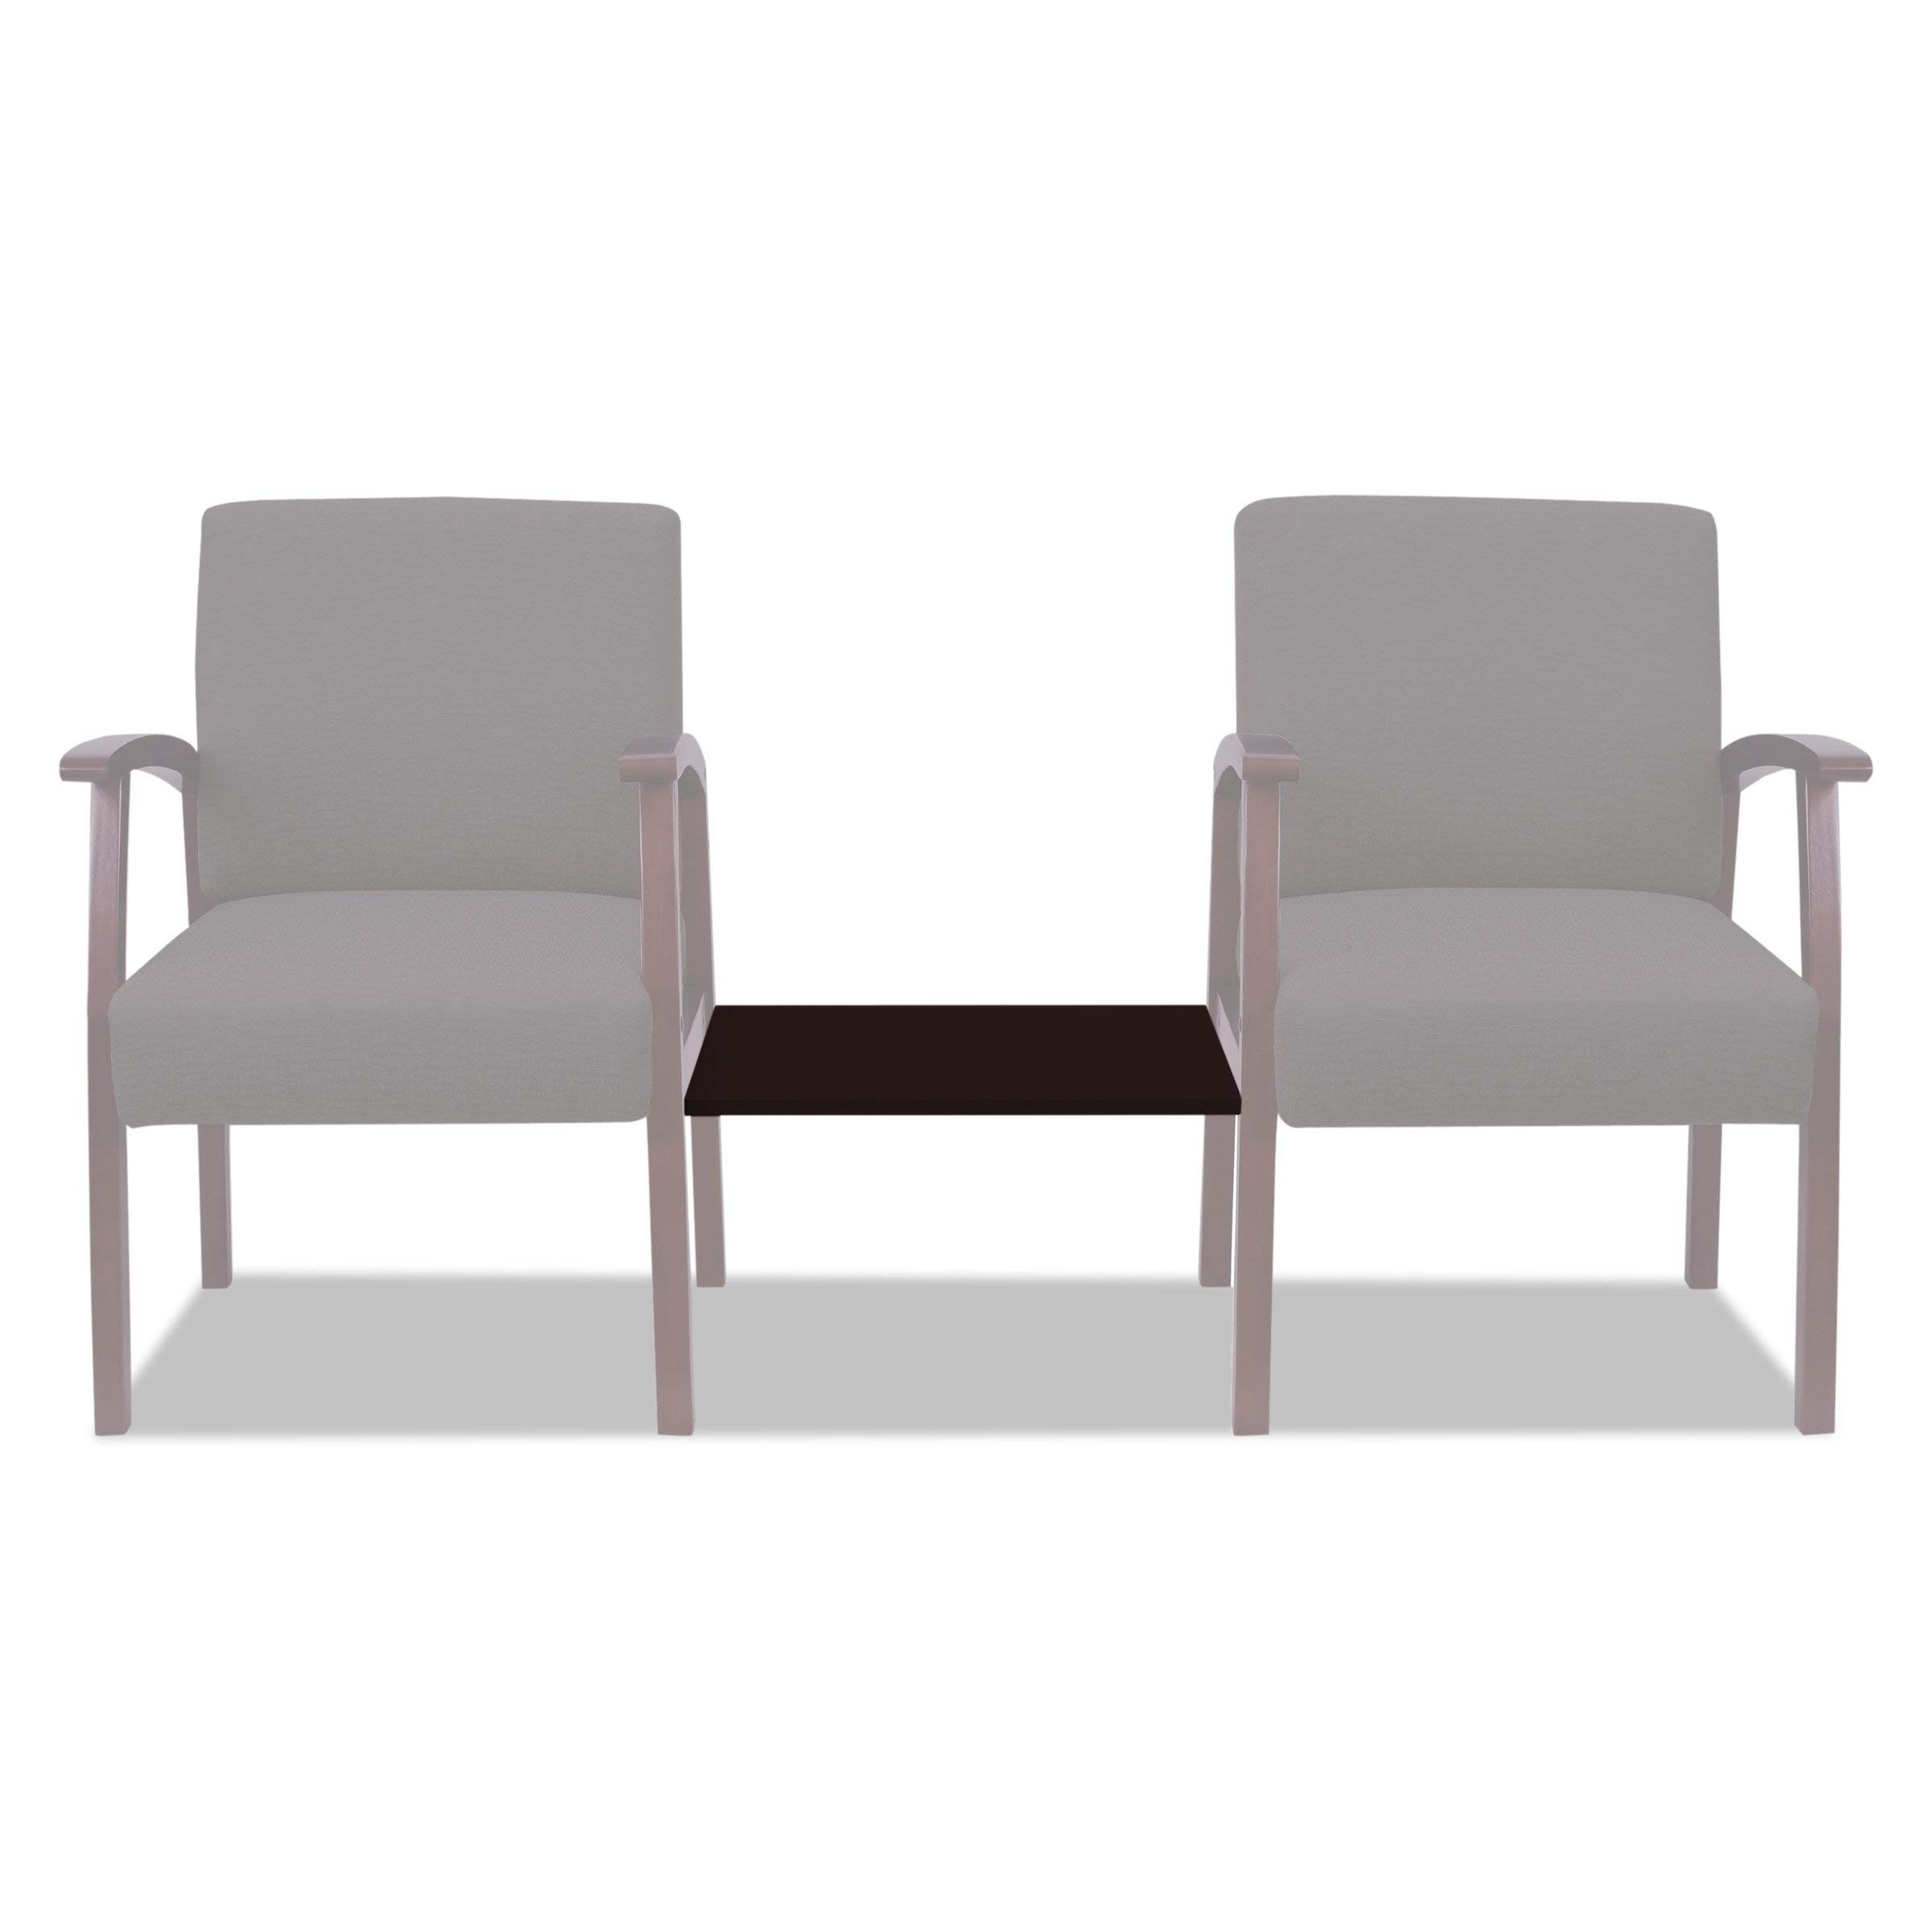 Alera ALERL7619M Reception Lounge 700 Series Ganging Table, 18 7/8 x 21 5/8, Mahogany